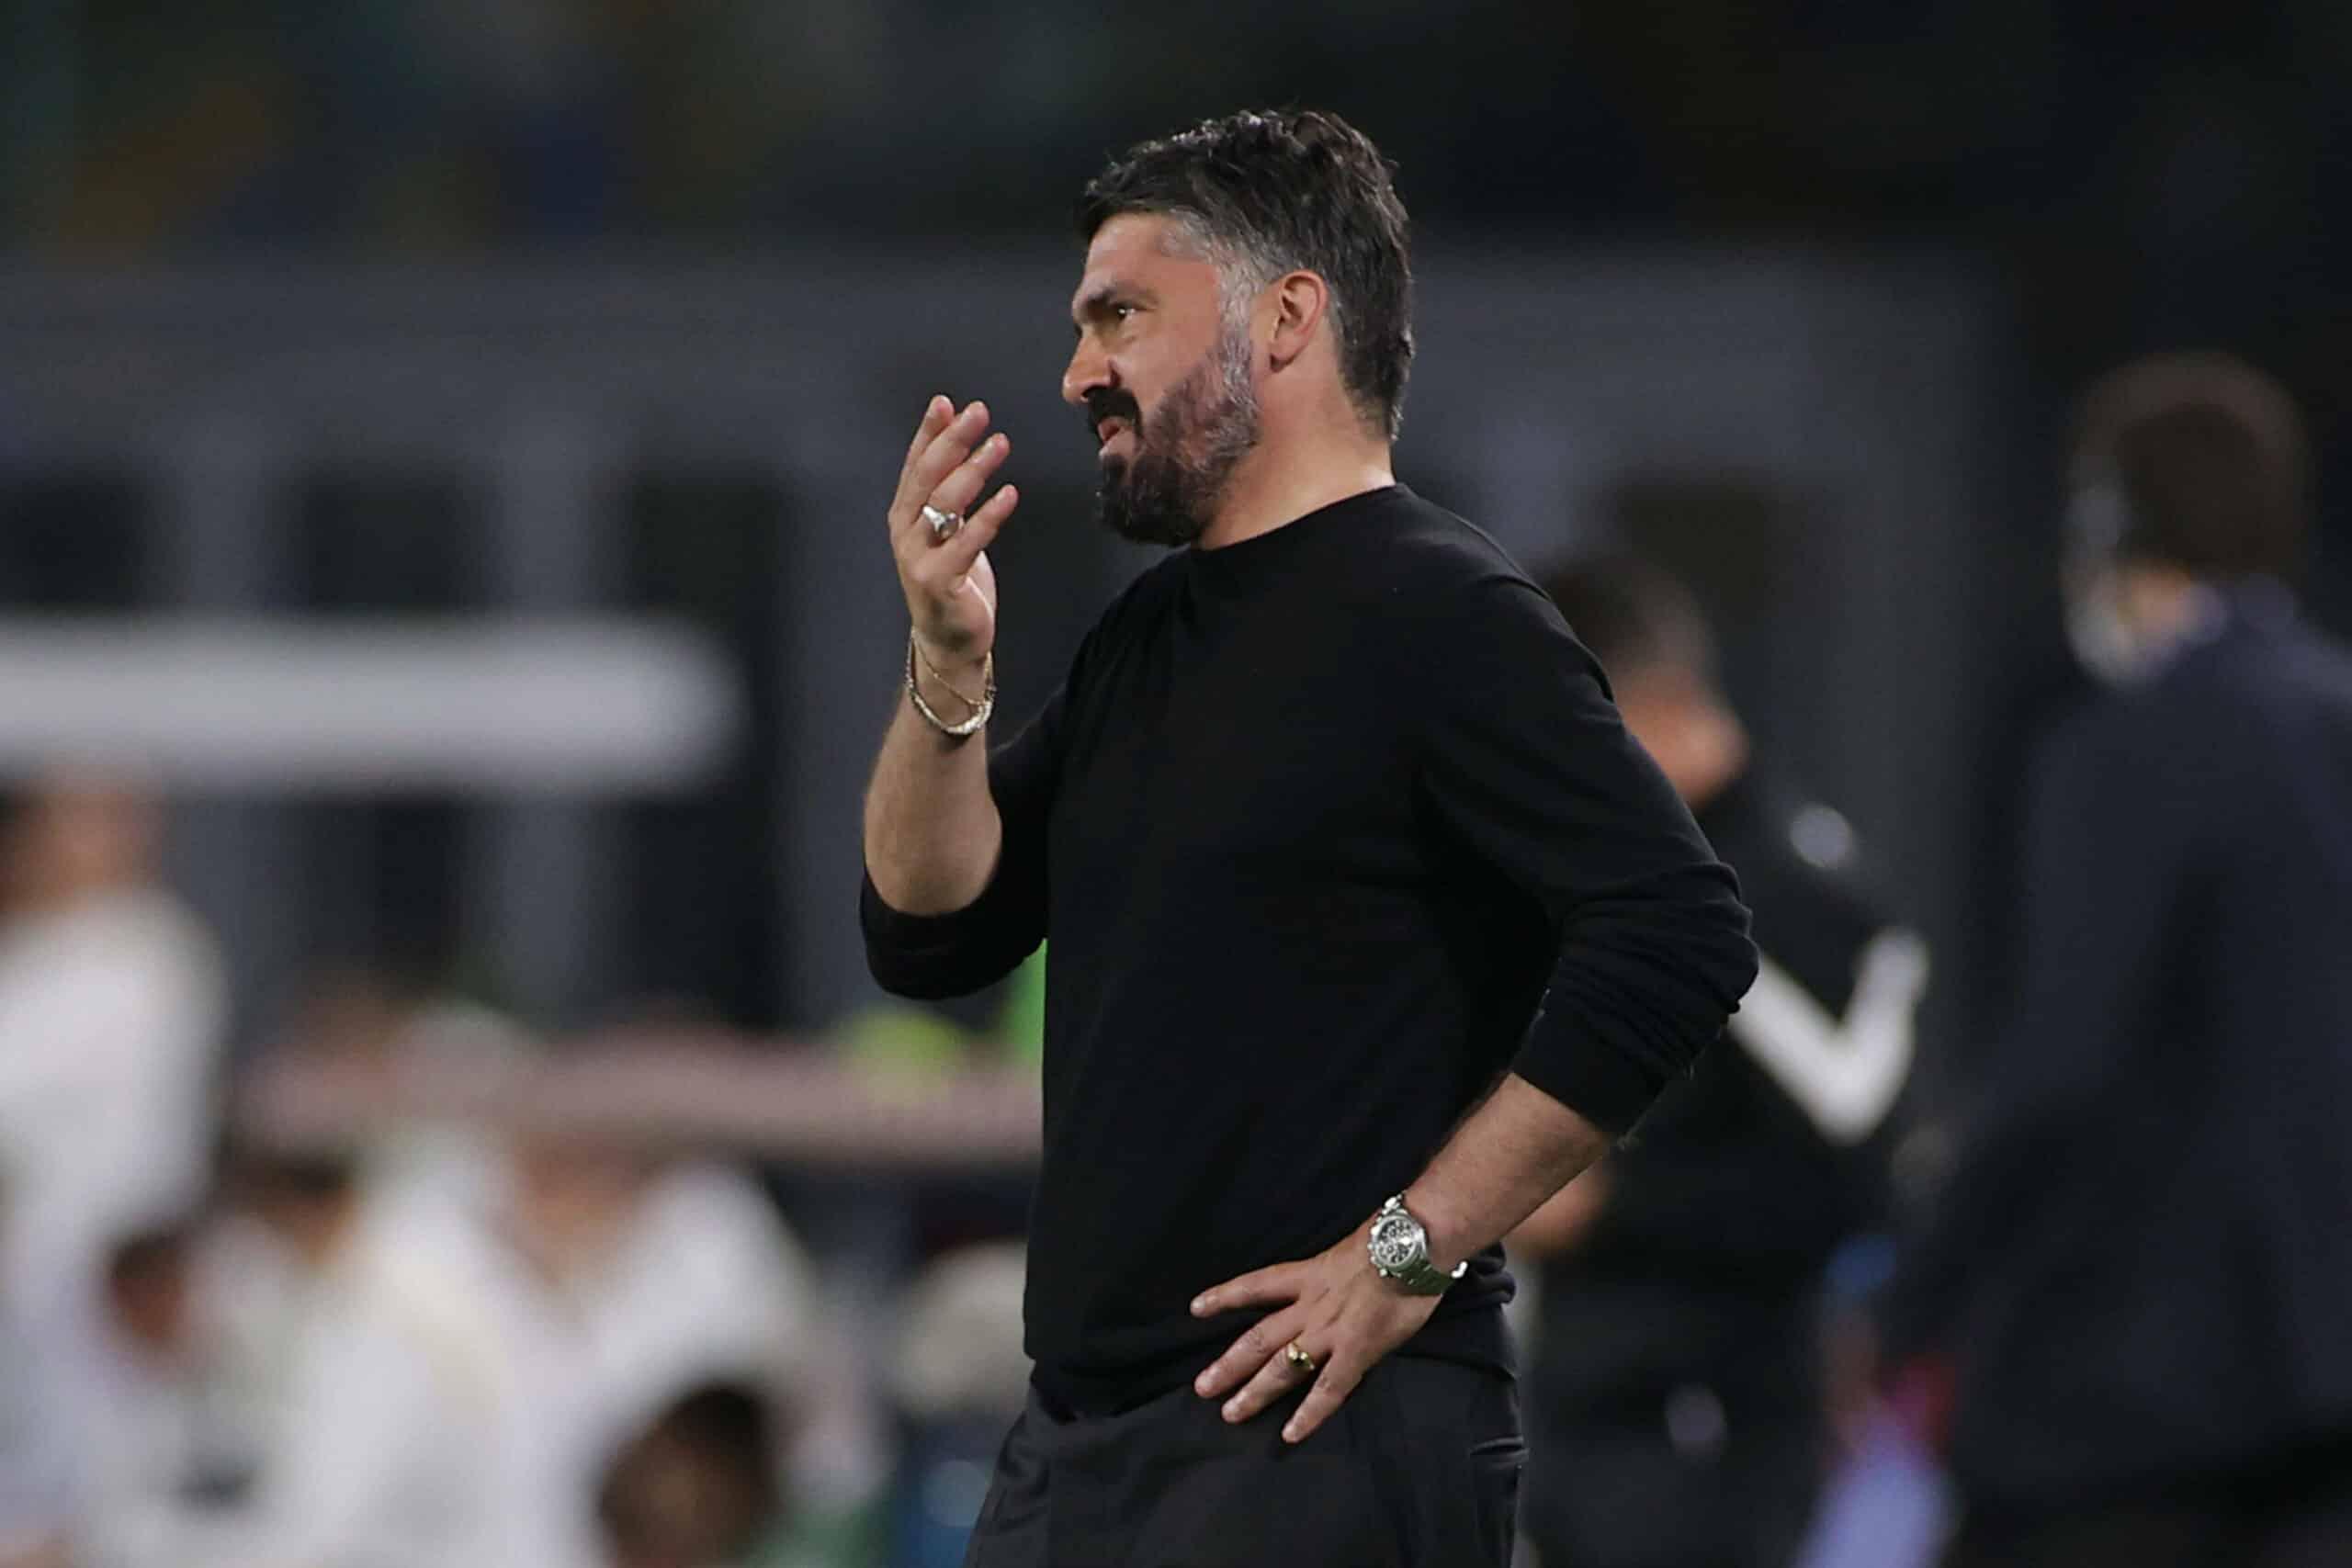 Gennaro Gattuso verärgert